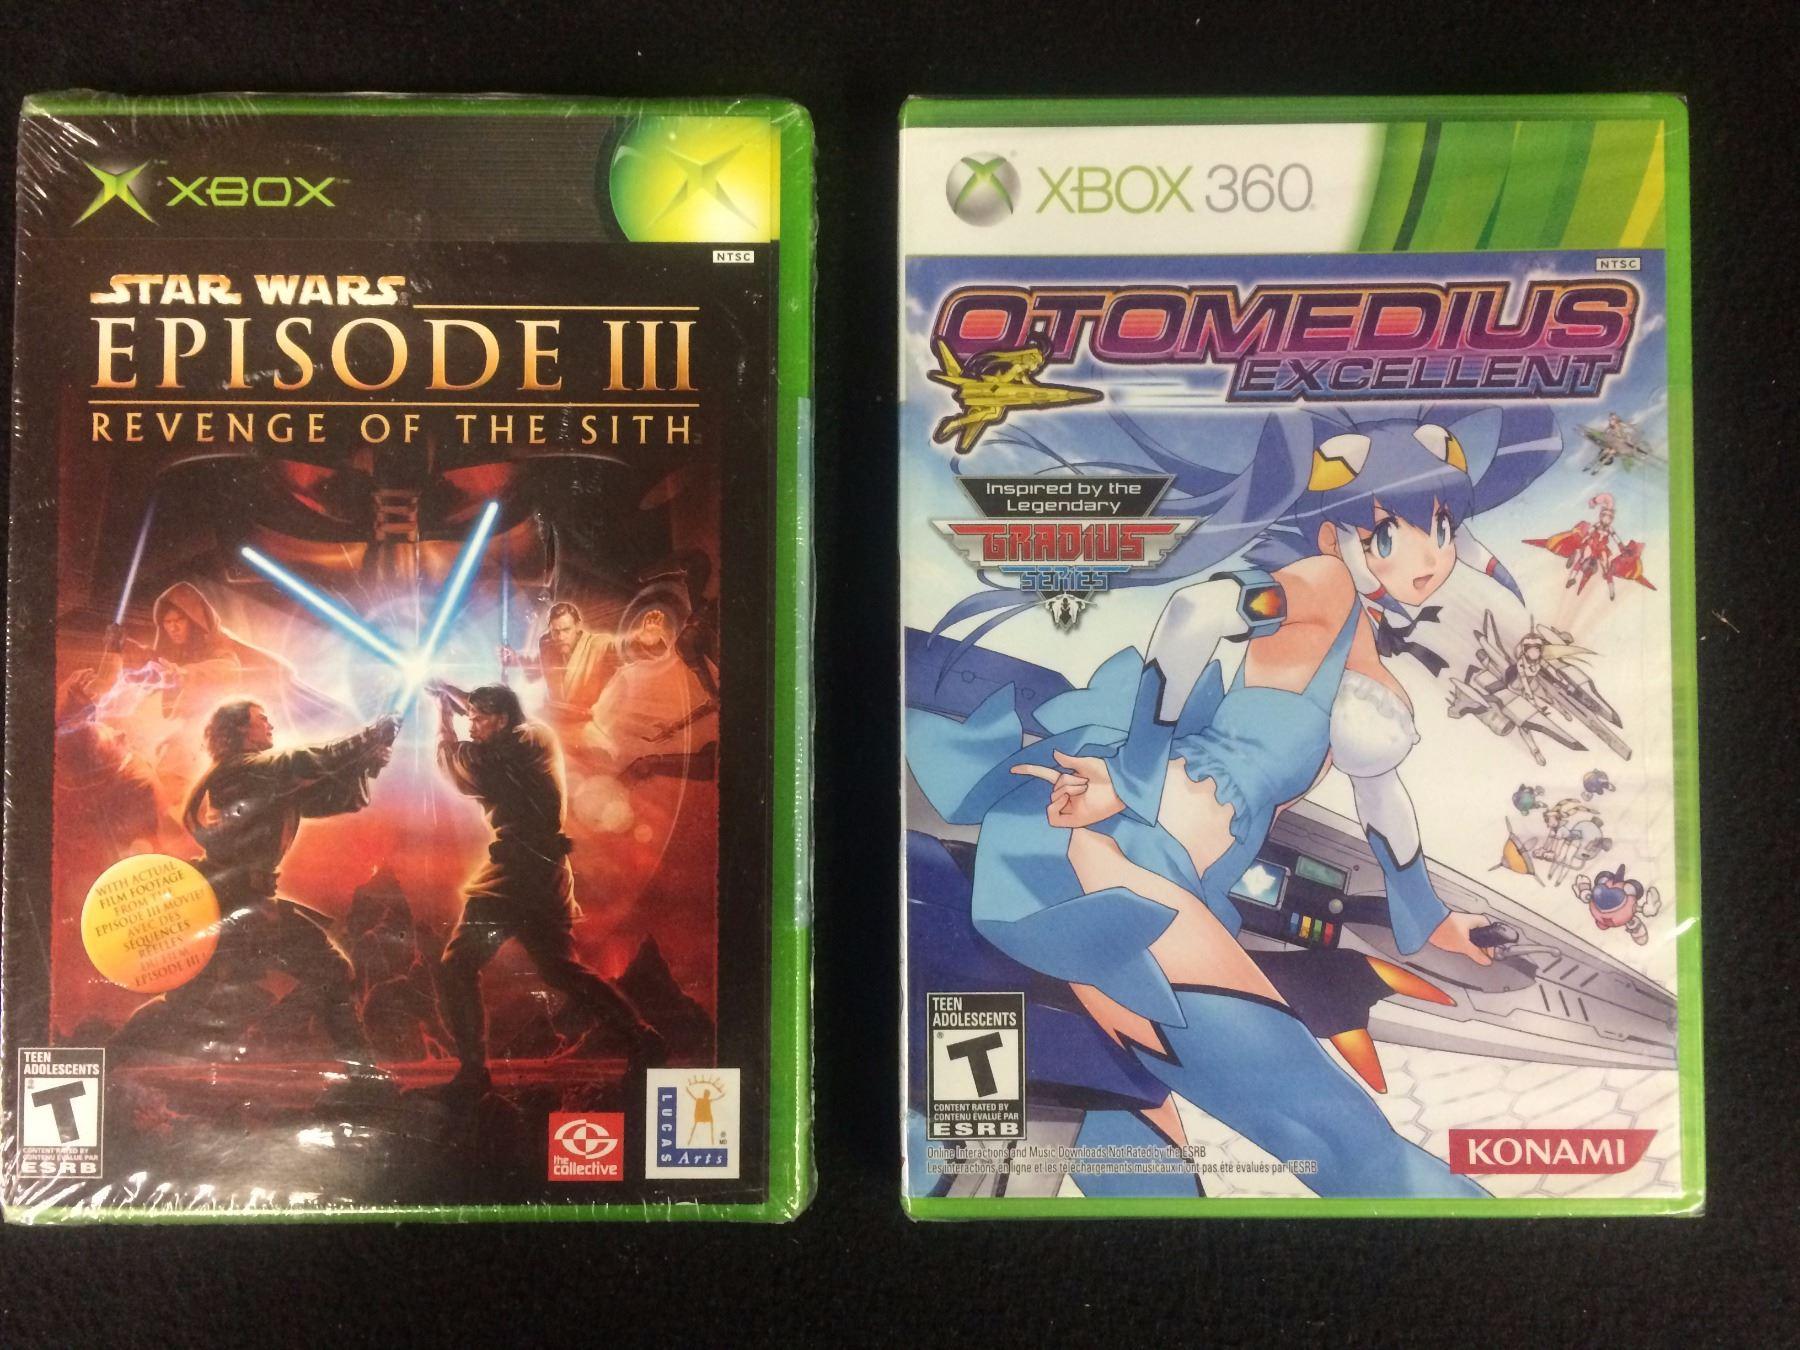 Xbox Xbox 360 Video Game Lot Star Wars Episode 3 Otomedius